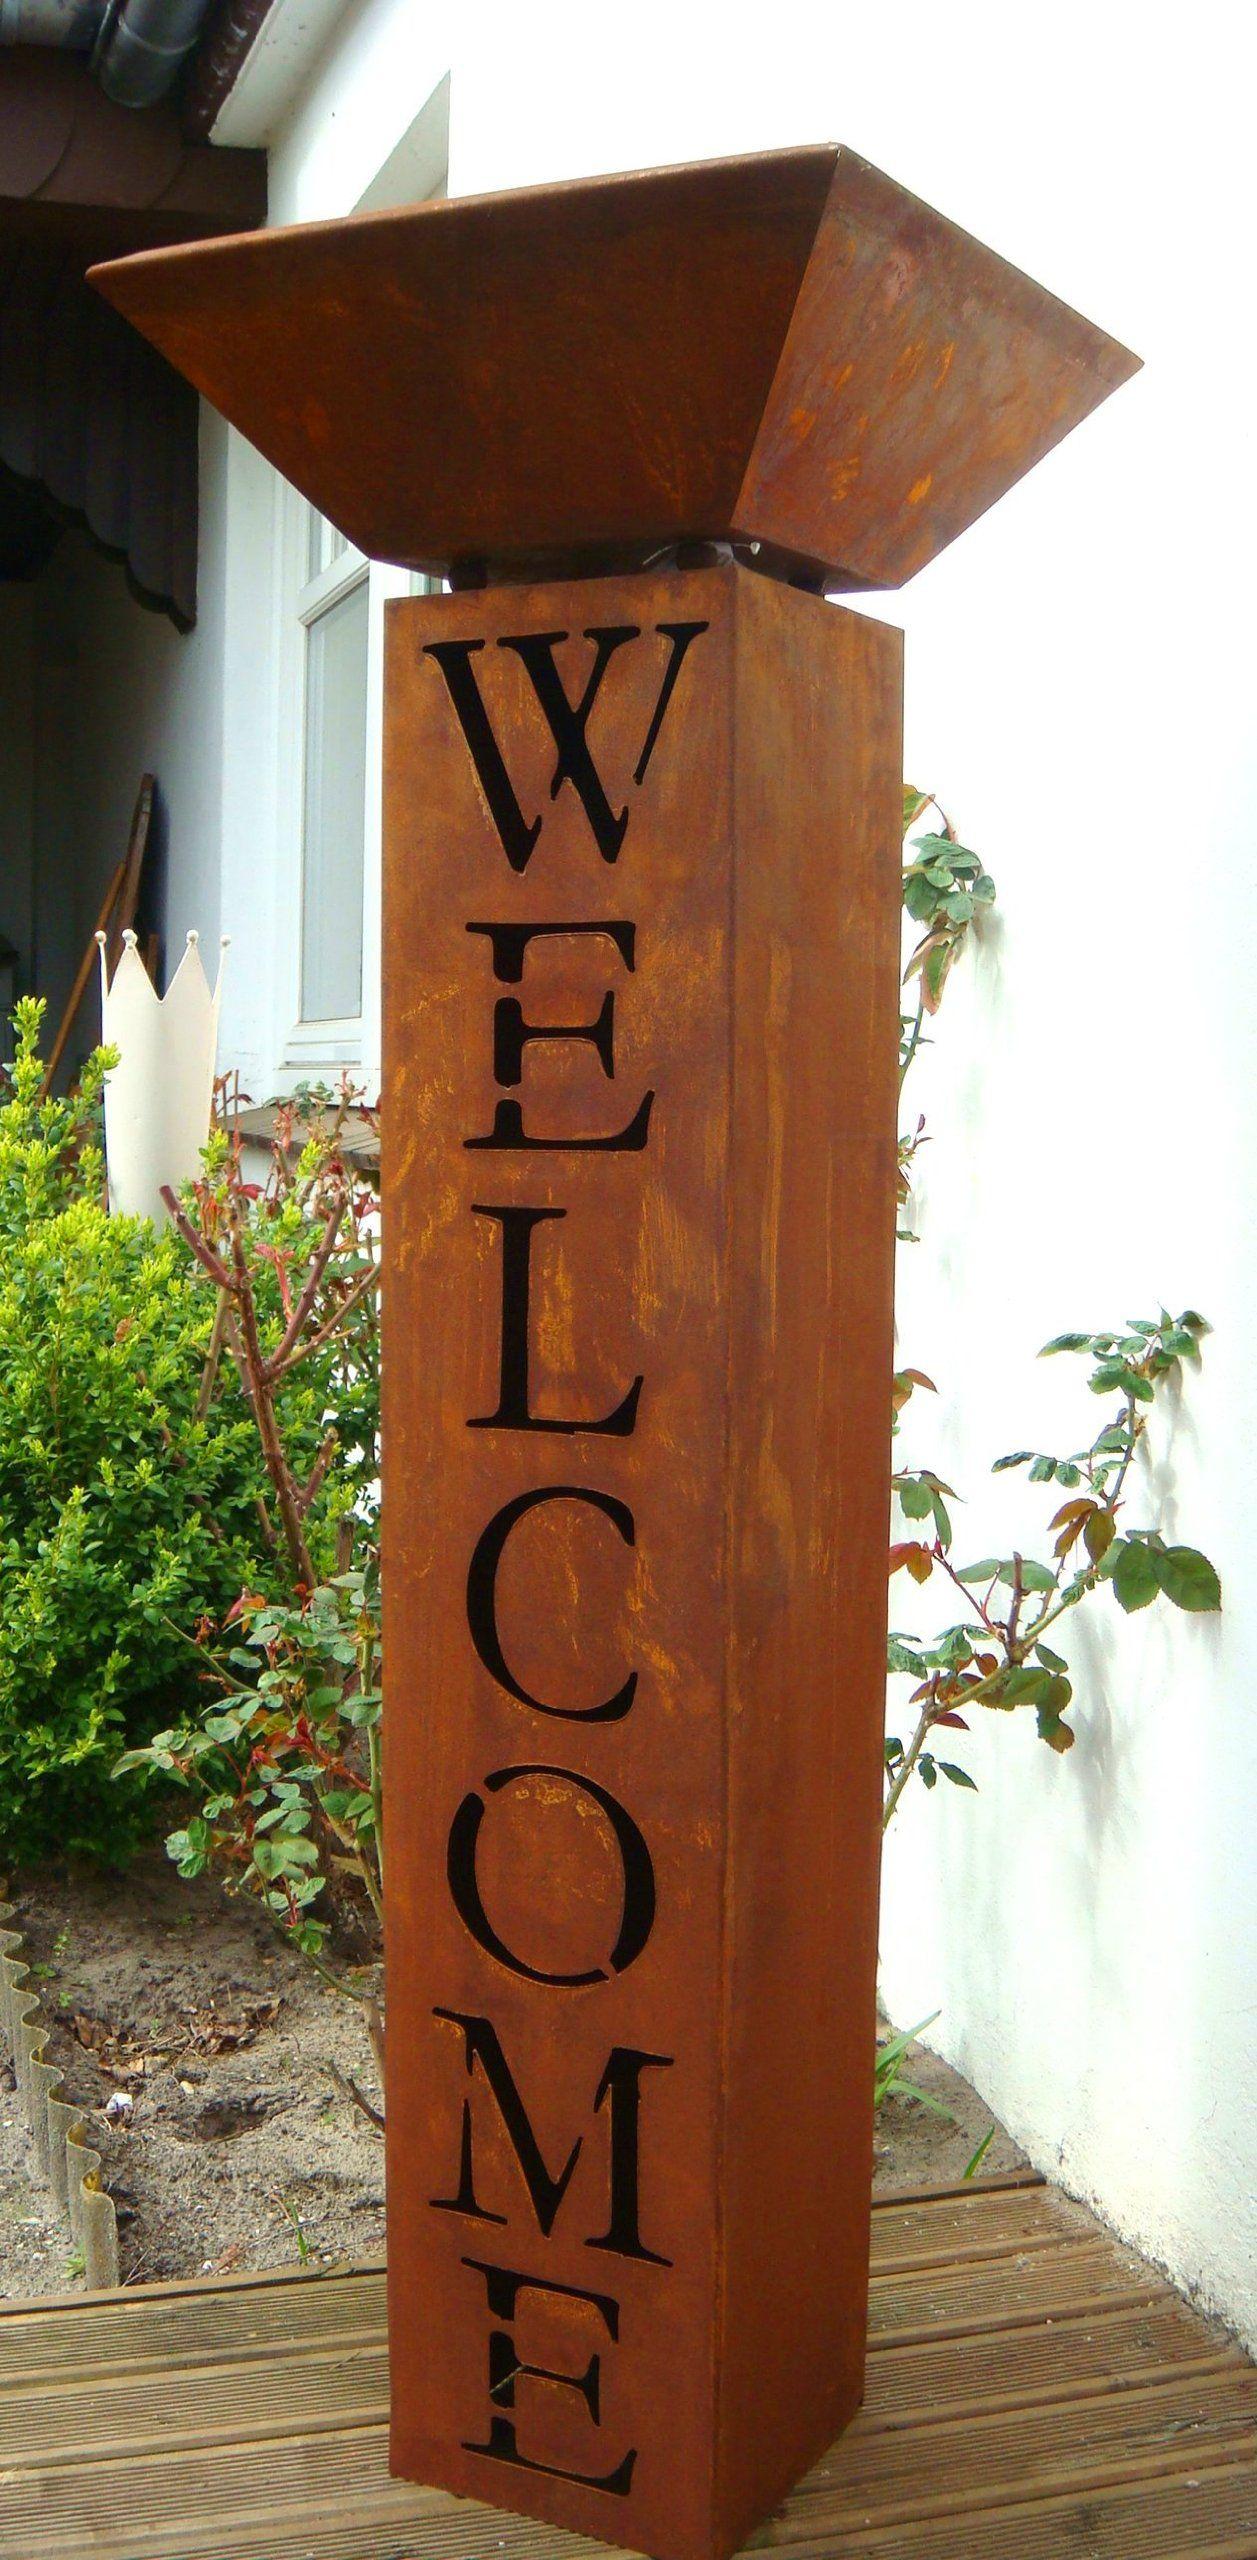 Gartendeko Metall säule mit schale rost welcome willkommen metall gartendeko edelrost